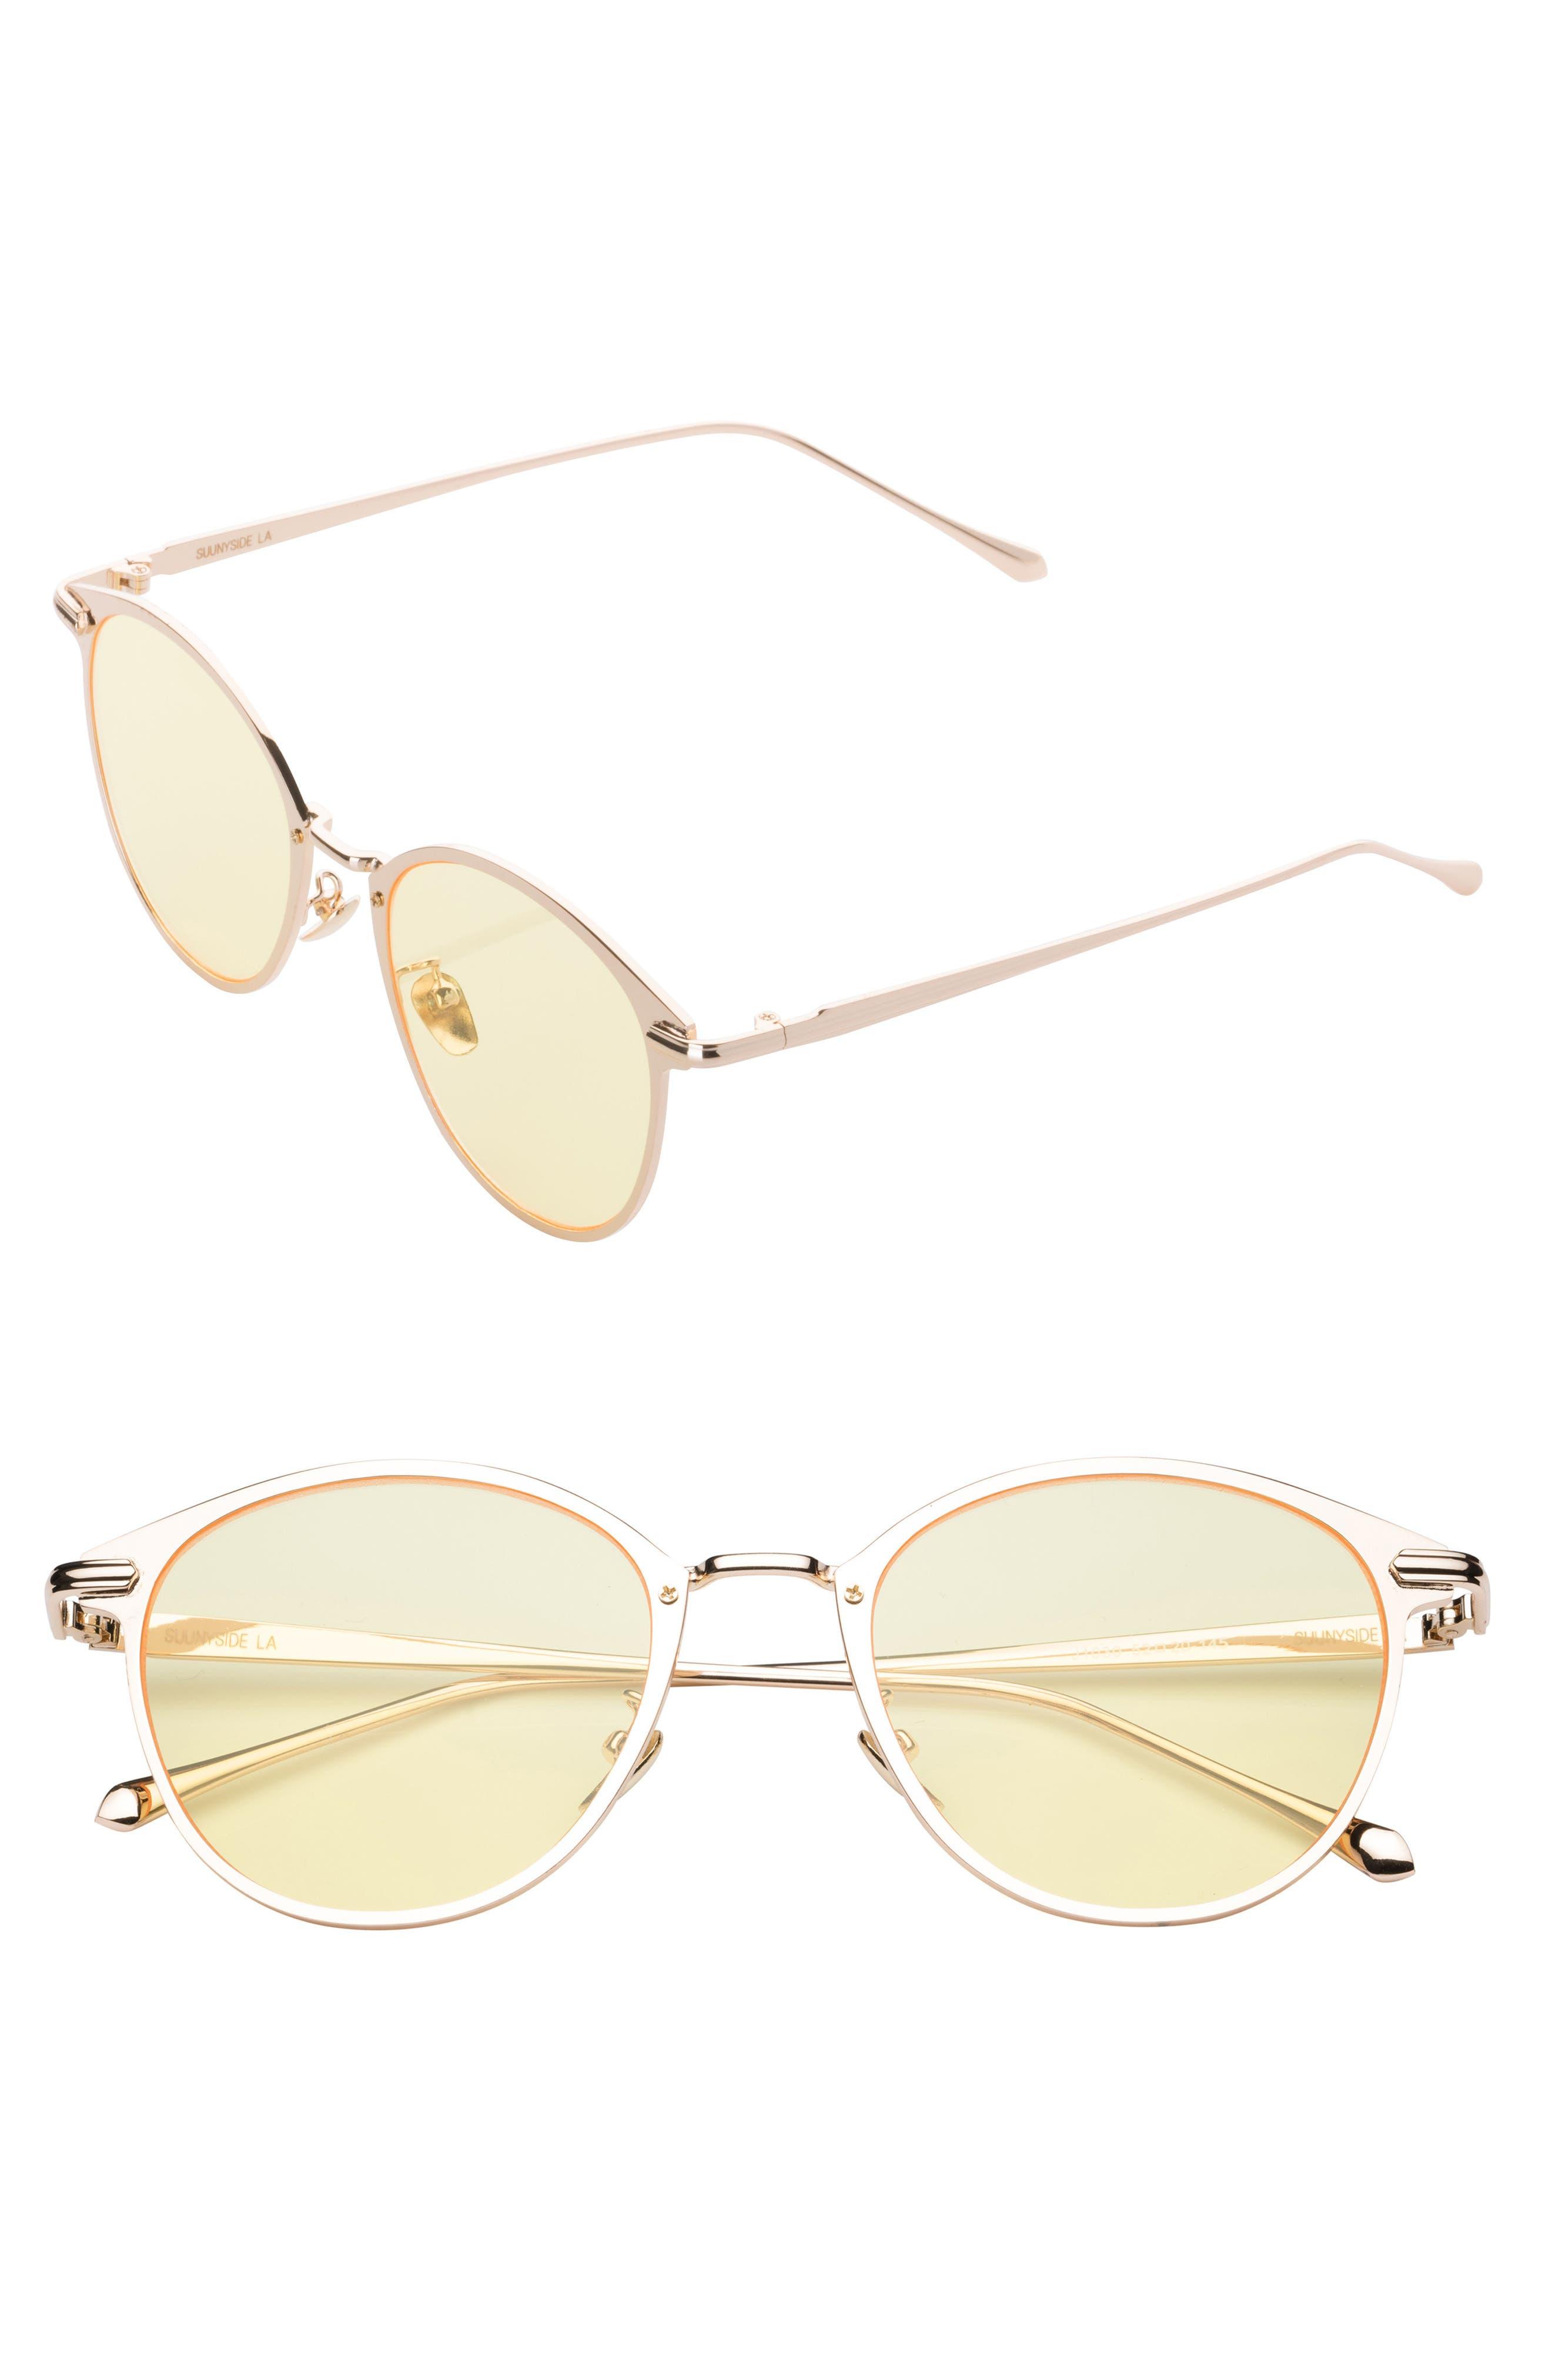 Main Image - SunnySide LA 51mm Oxford Sunglasses